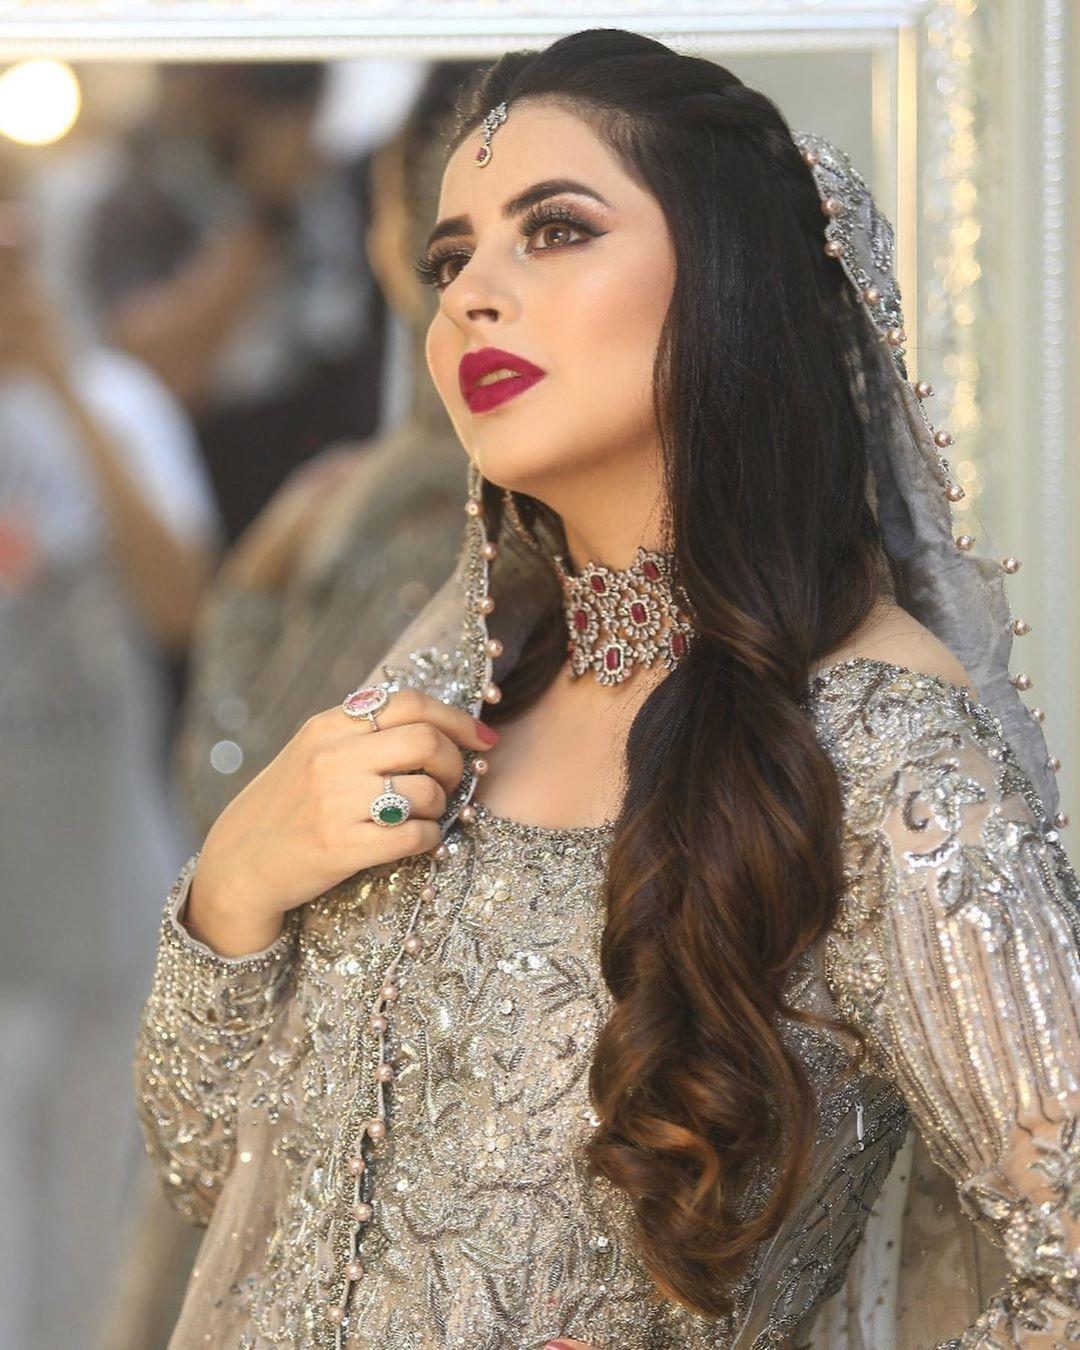 Fatima Effendi 3